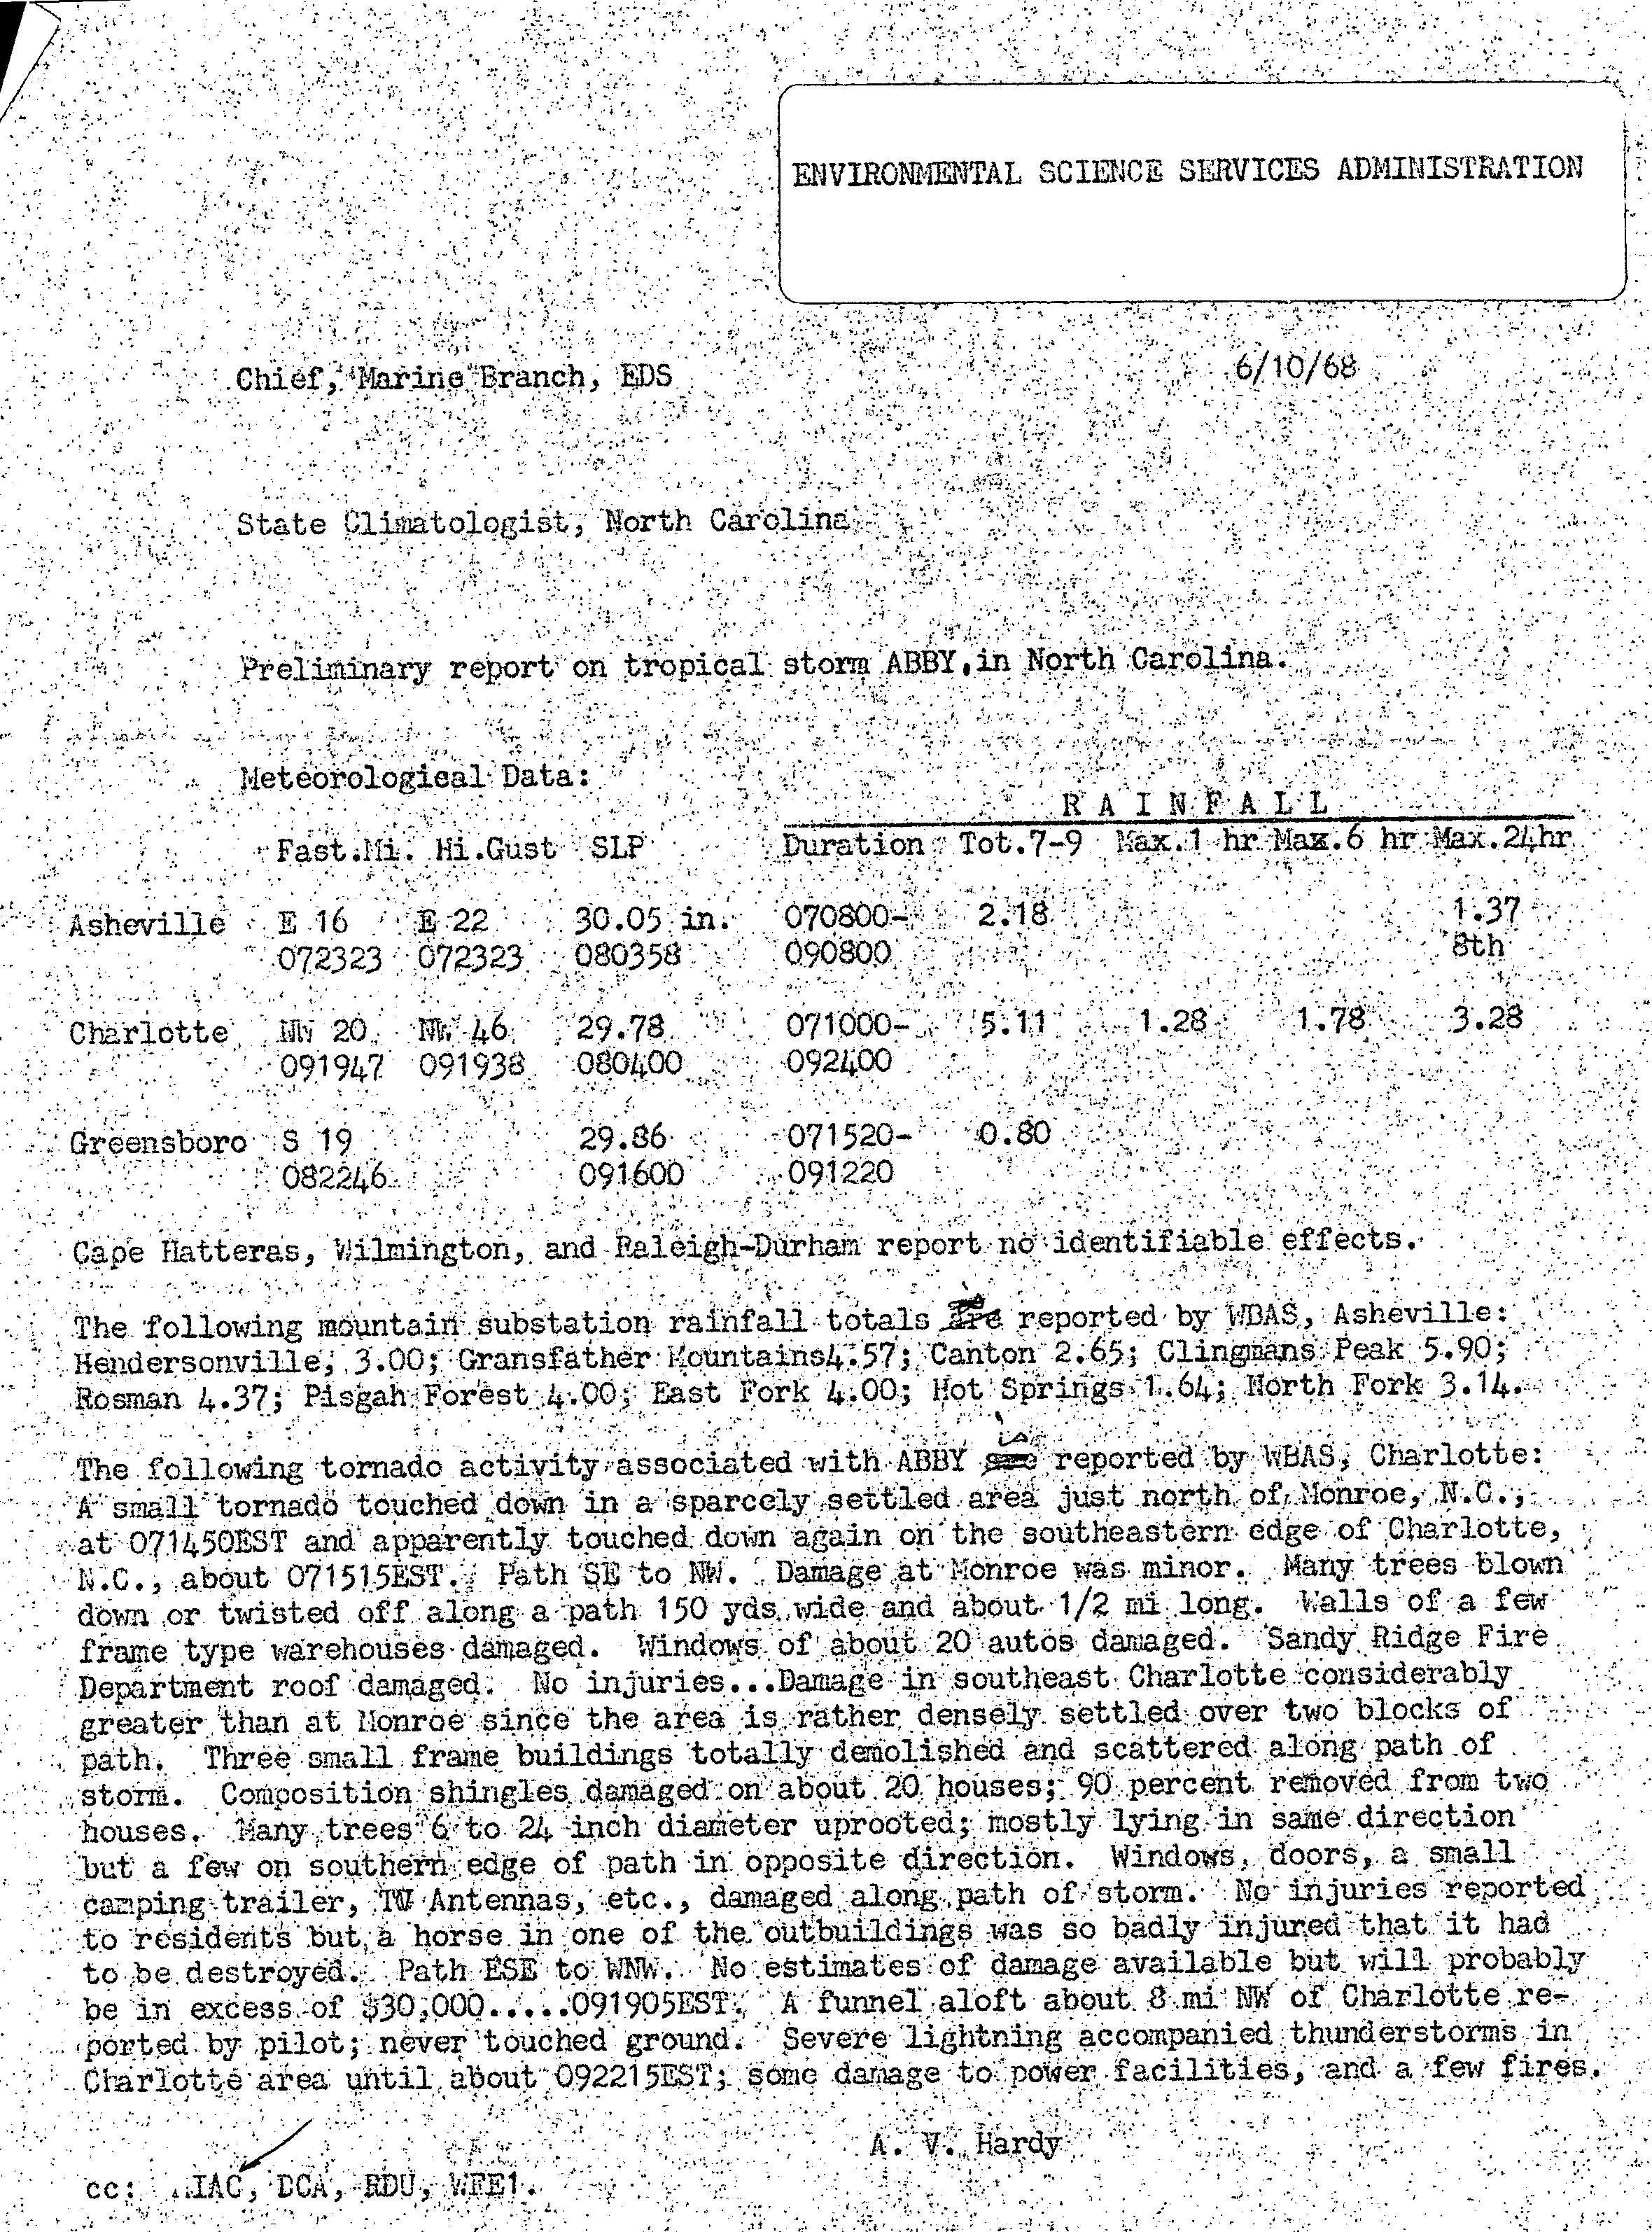 1968 Atlantic hurricane season